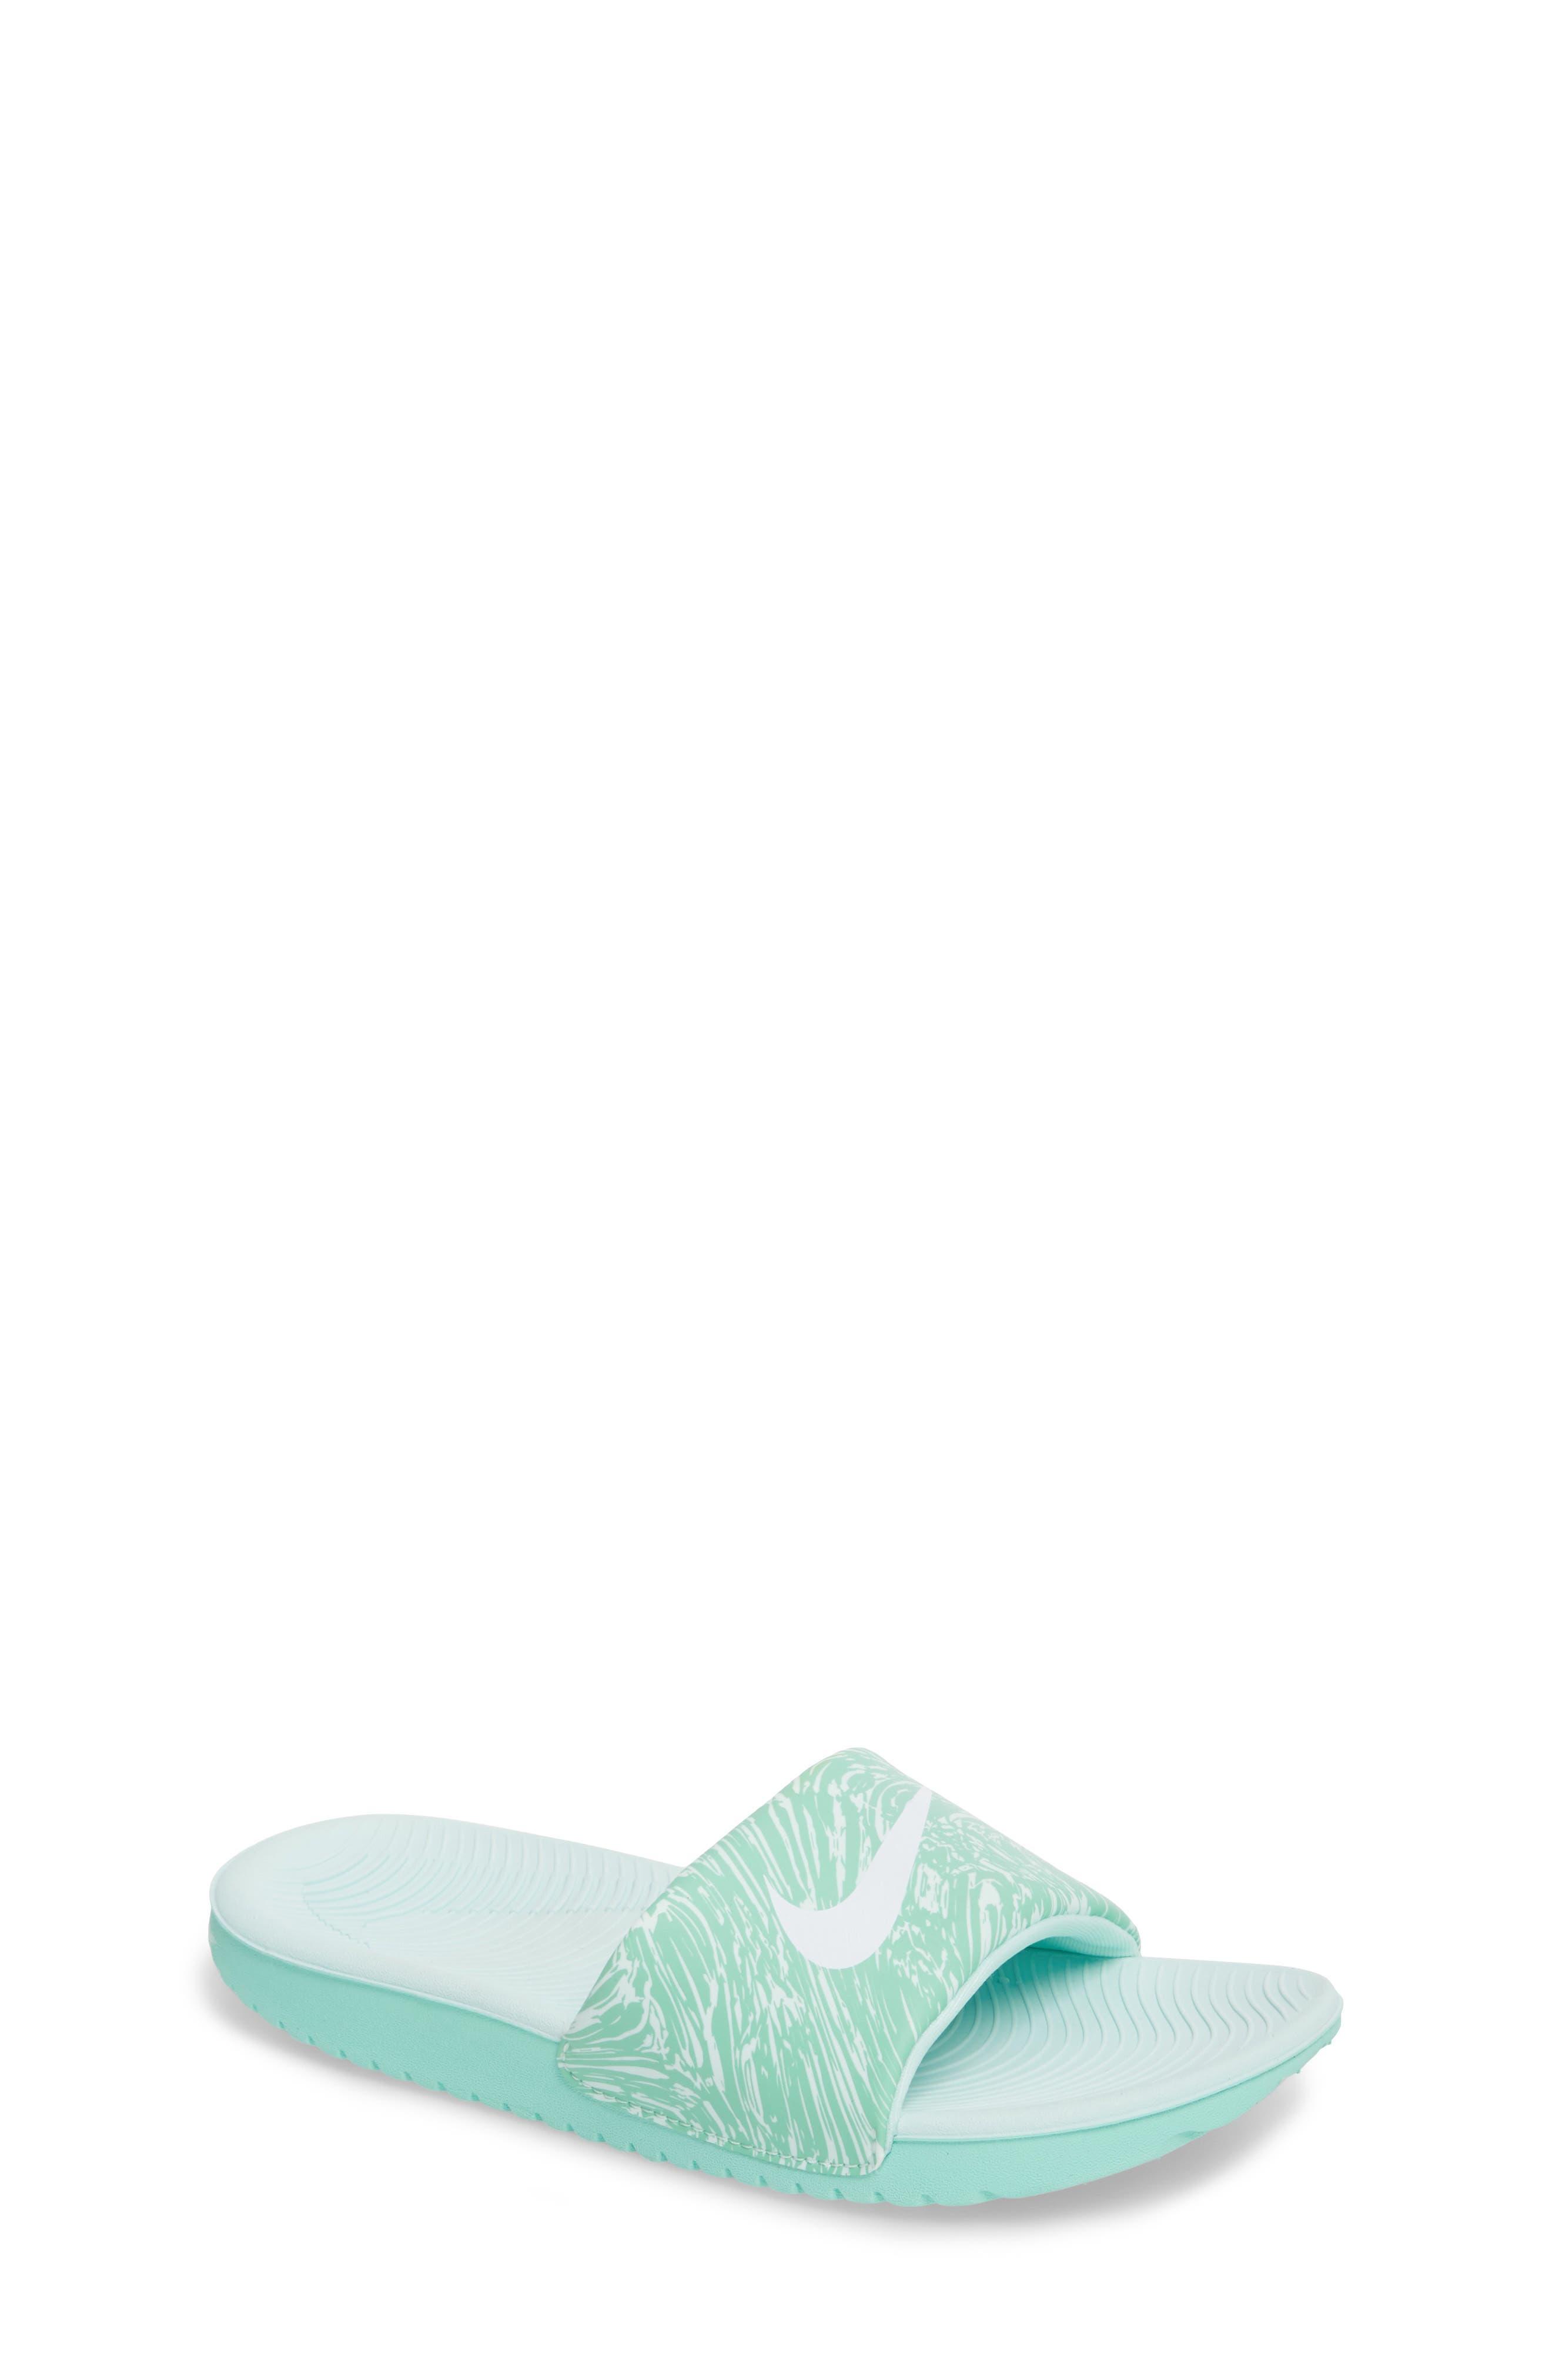 'Kawa' Print Slide Sandal,                         Main,                         color, Emerald Rise/ White/ Igloo